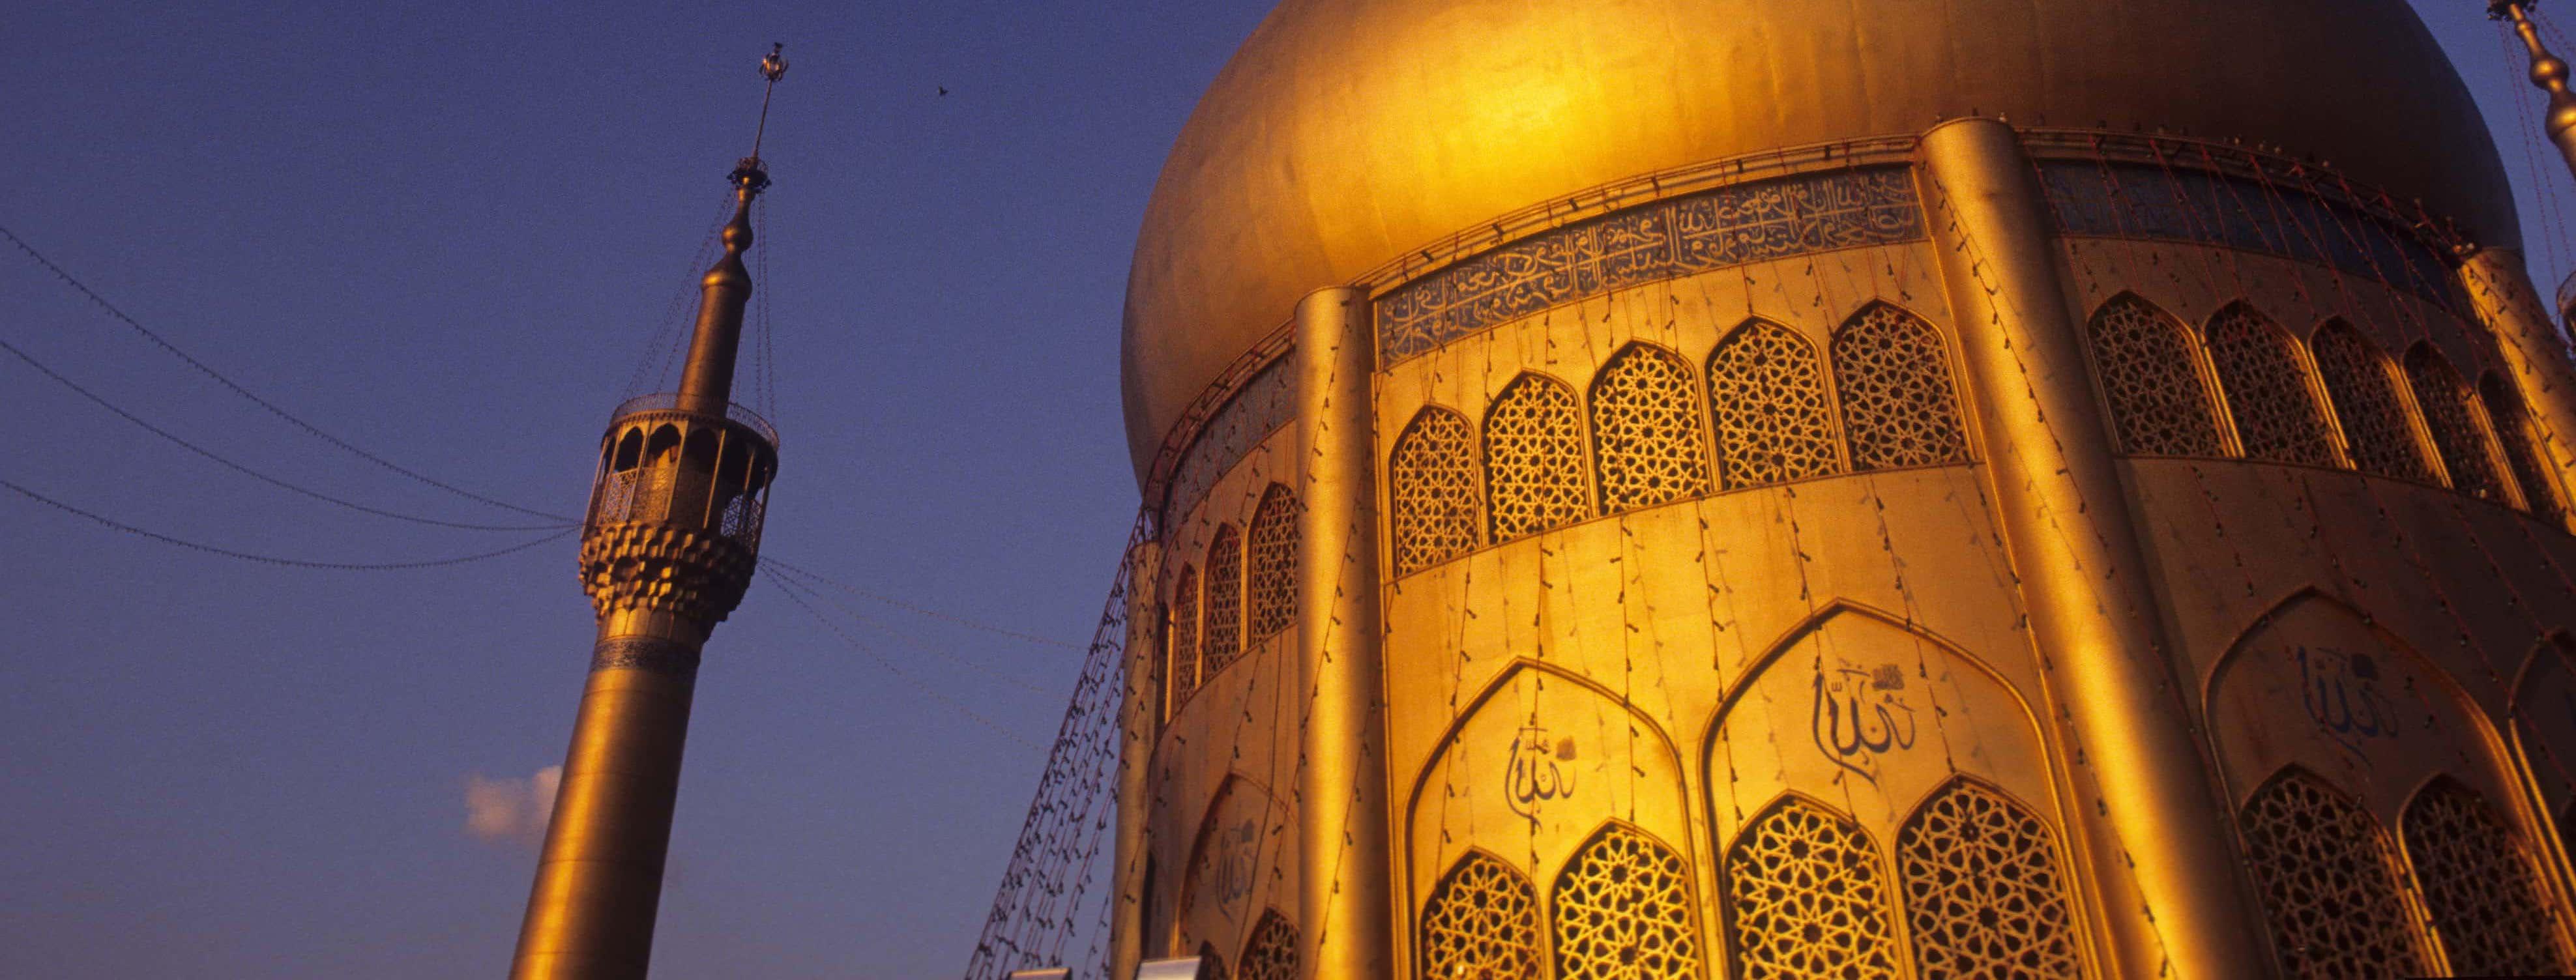 Mausoleum of Ayatollah Khomeini in Tehran, Iran. (Photo: Kaveh Kazemi/Getty Images)